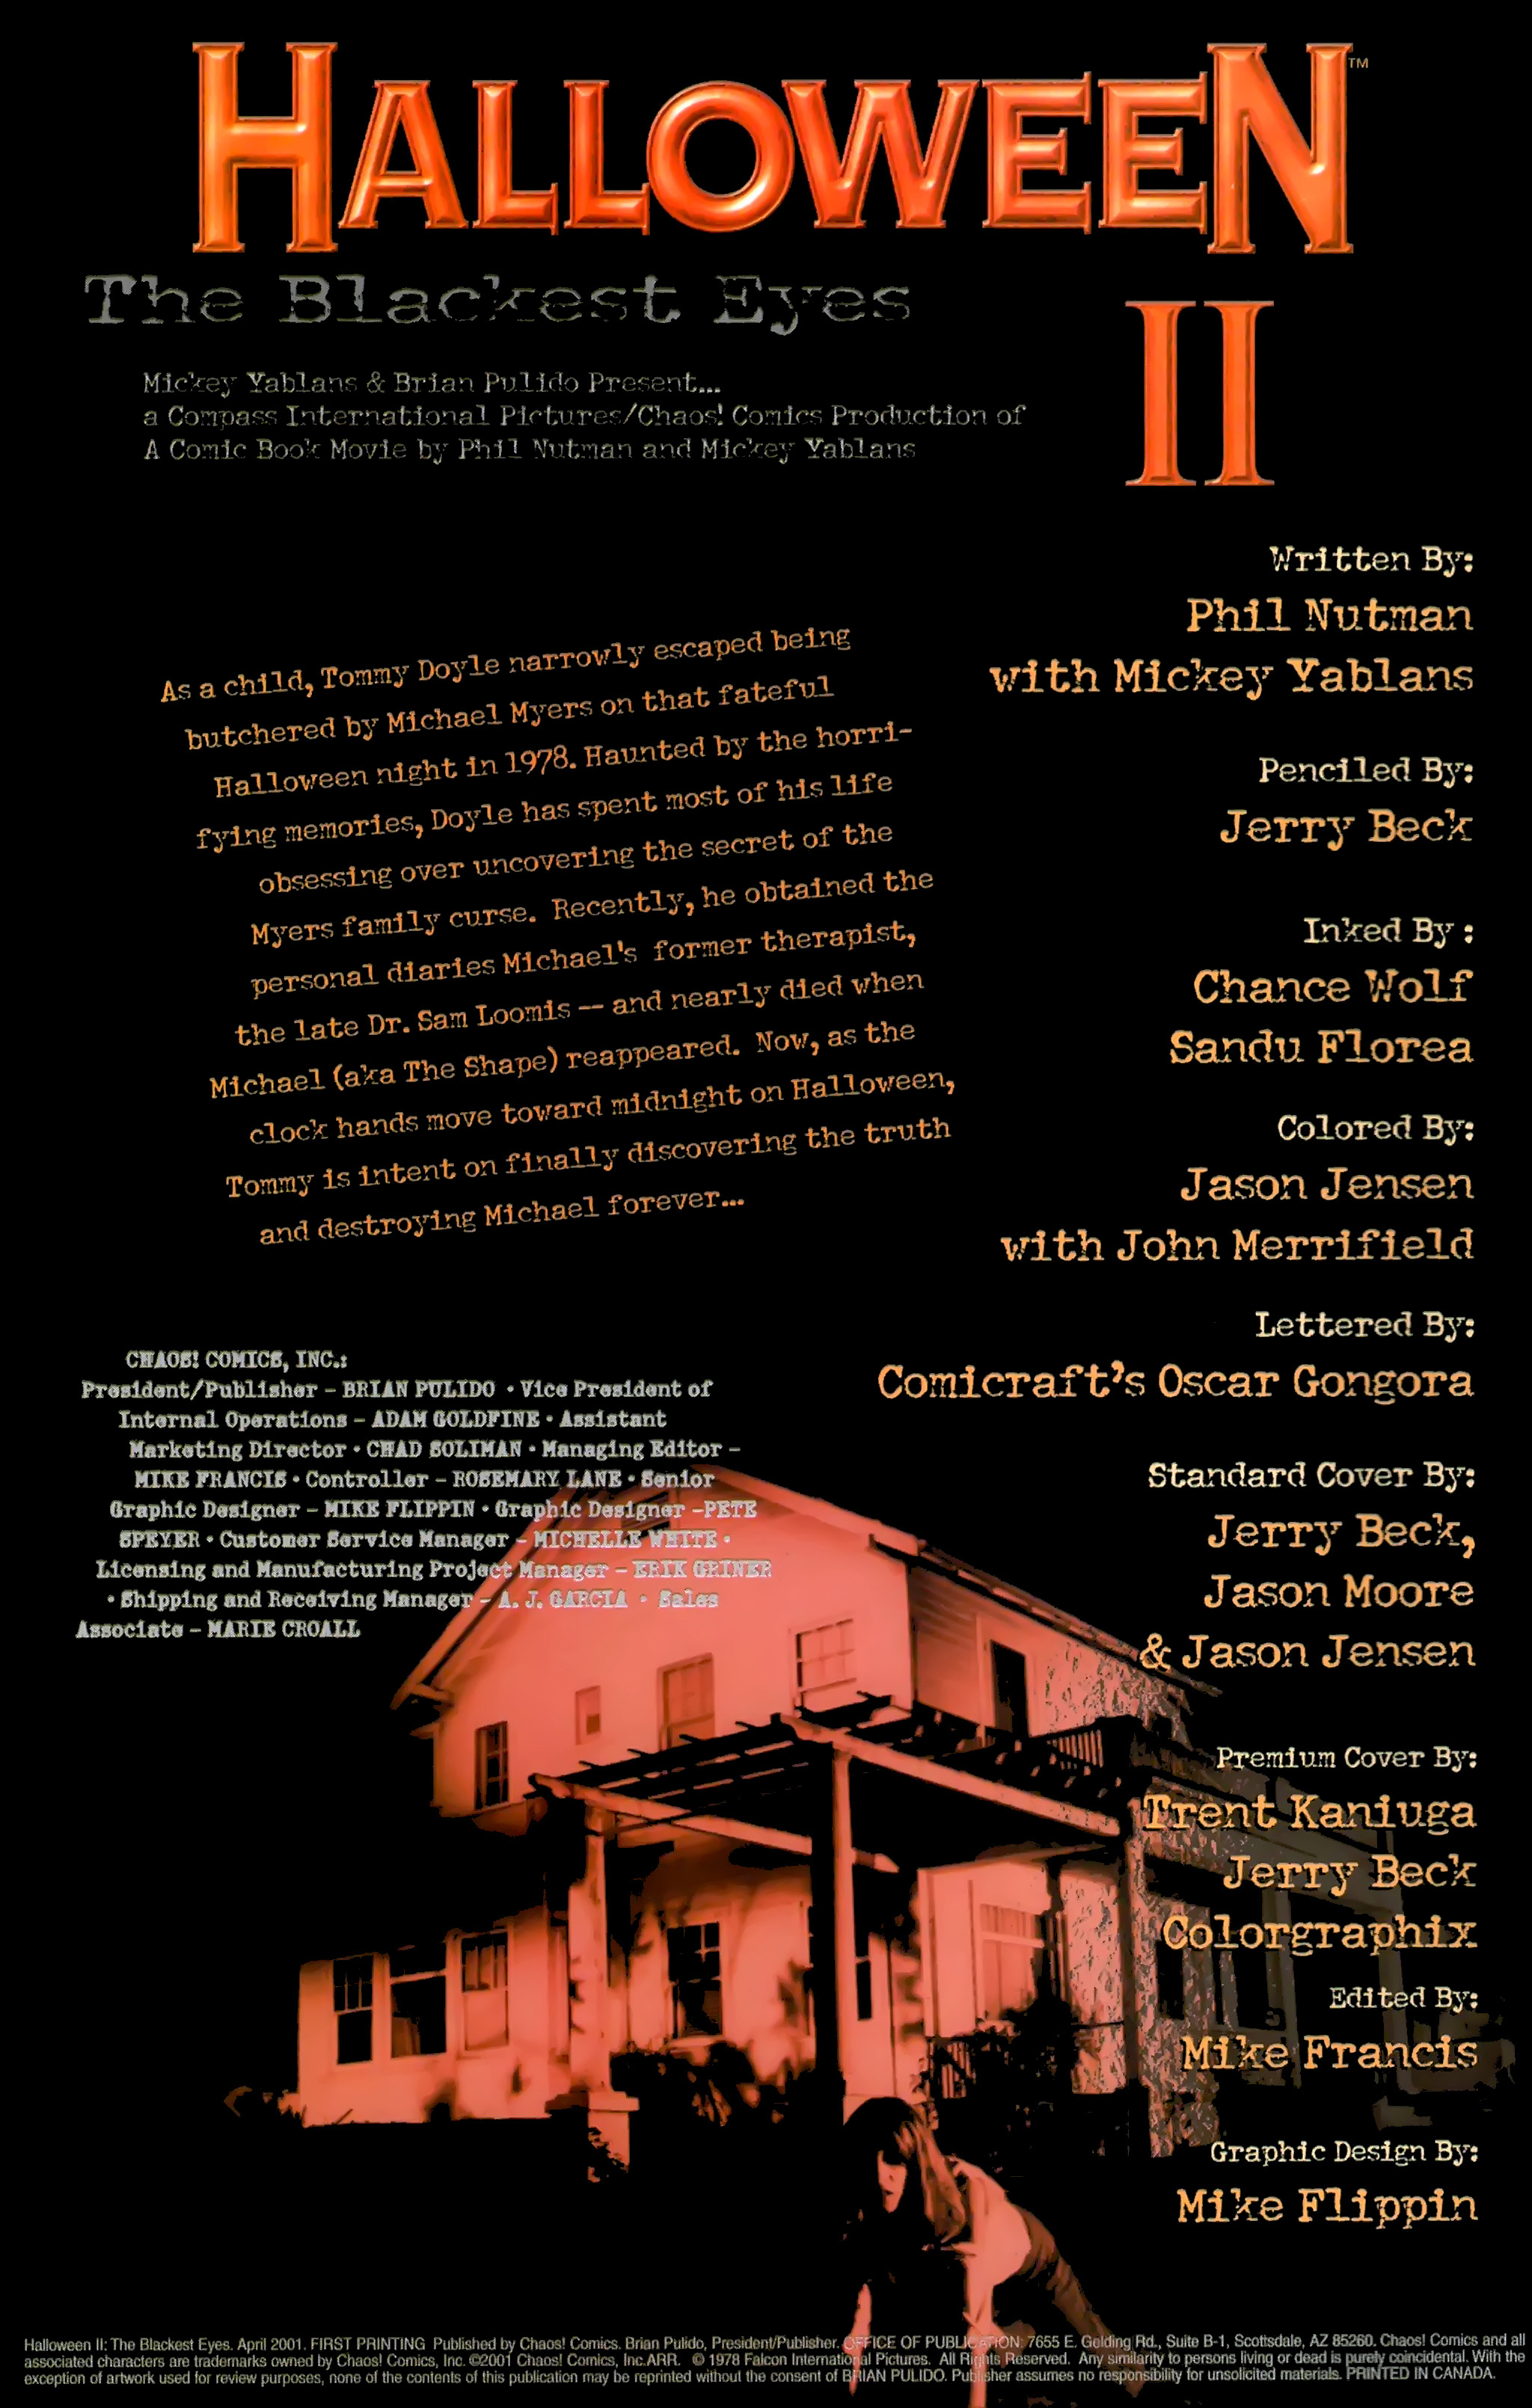 Read online Halloween II: The Blackest Eyes comic -  Issue # Full - 2